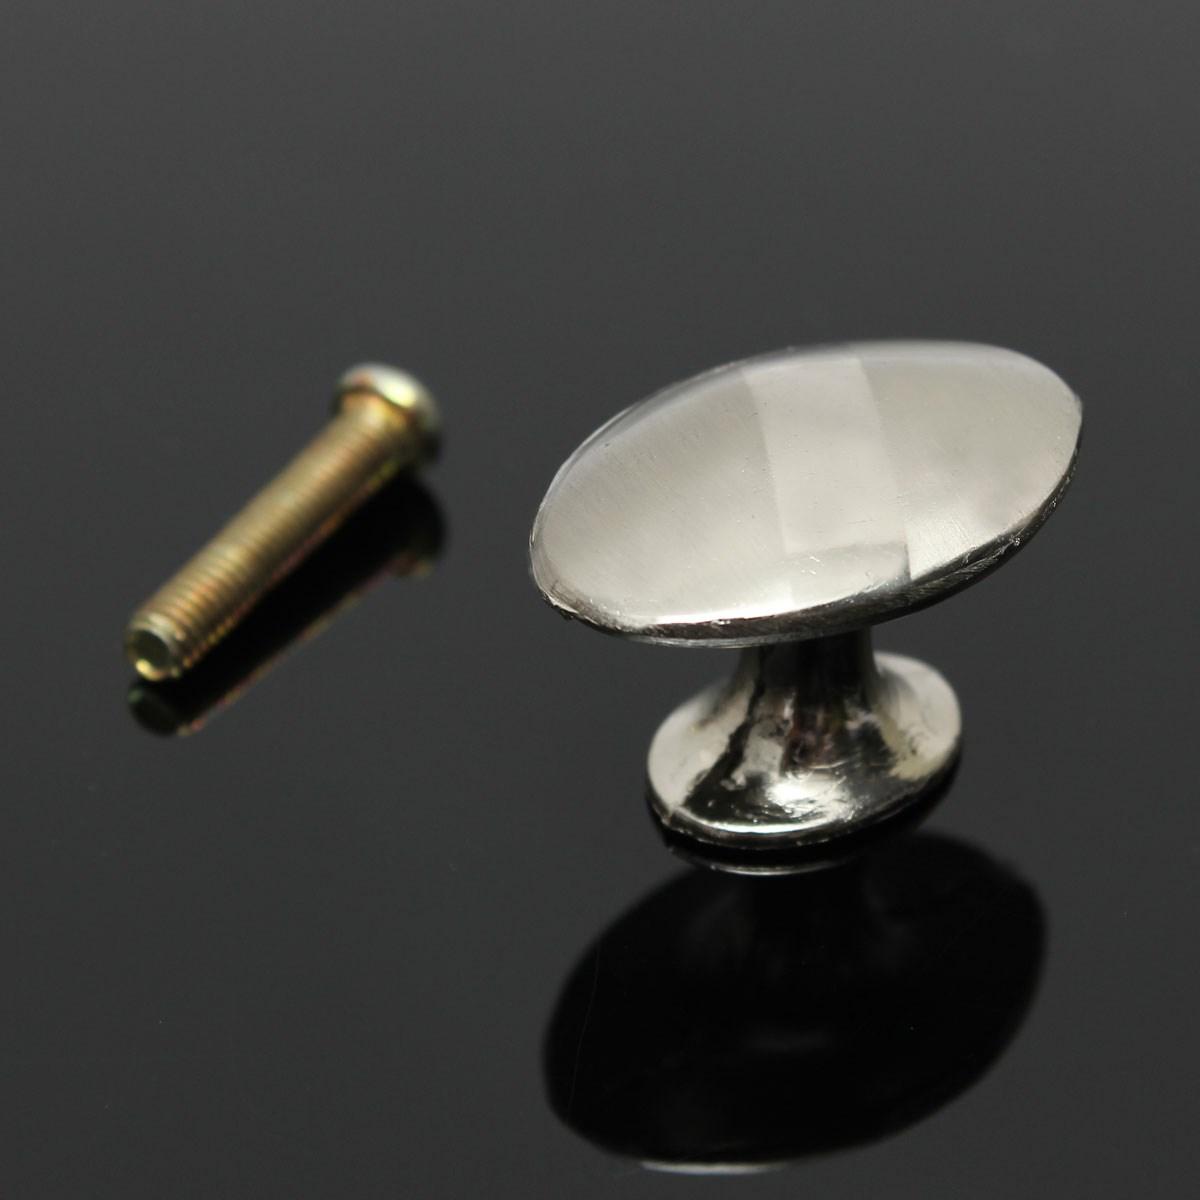 New 30mm Stainless Steel Zinc Satin Knob Pull Handle Kitchen Cabinet Hardware +Screw(China (Mainland))